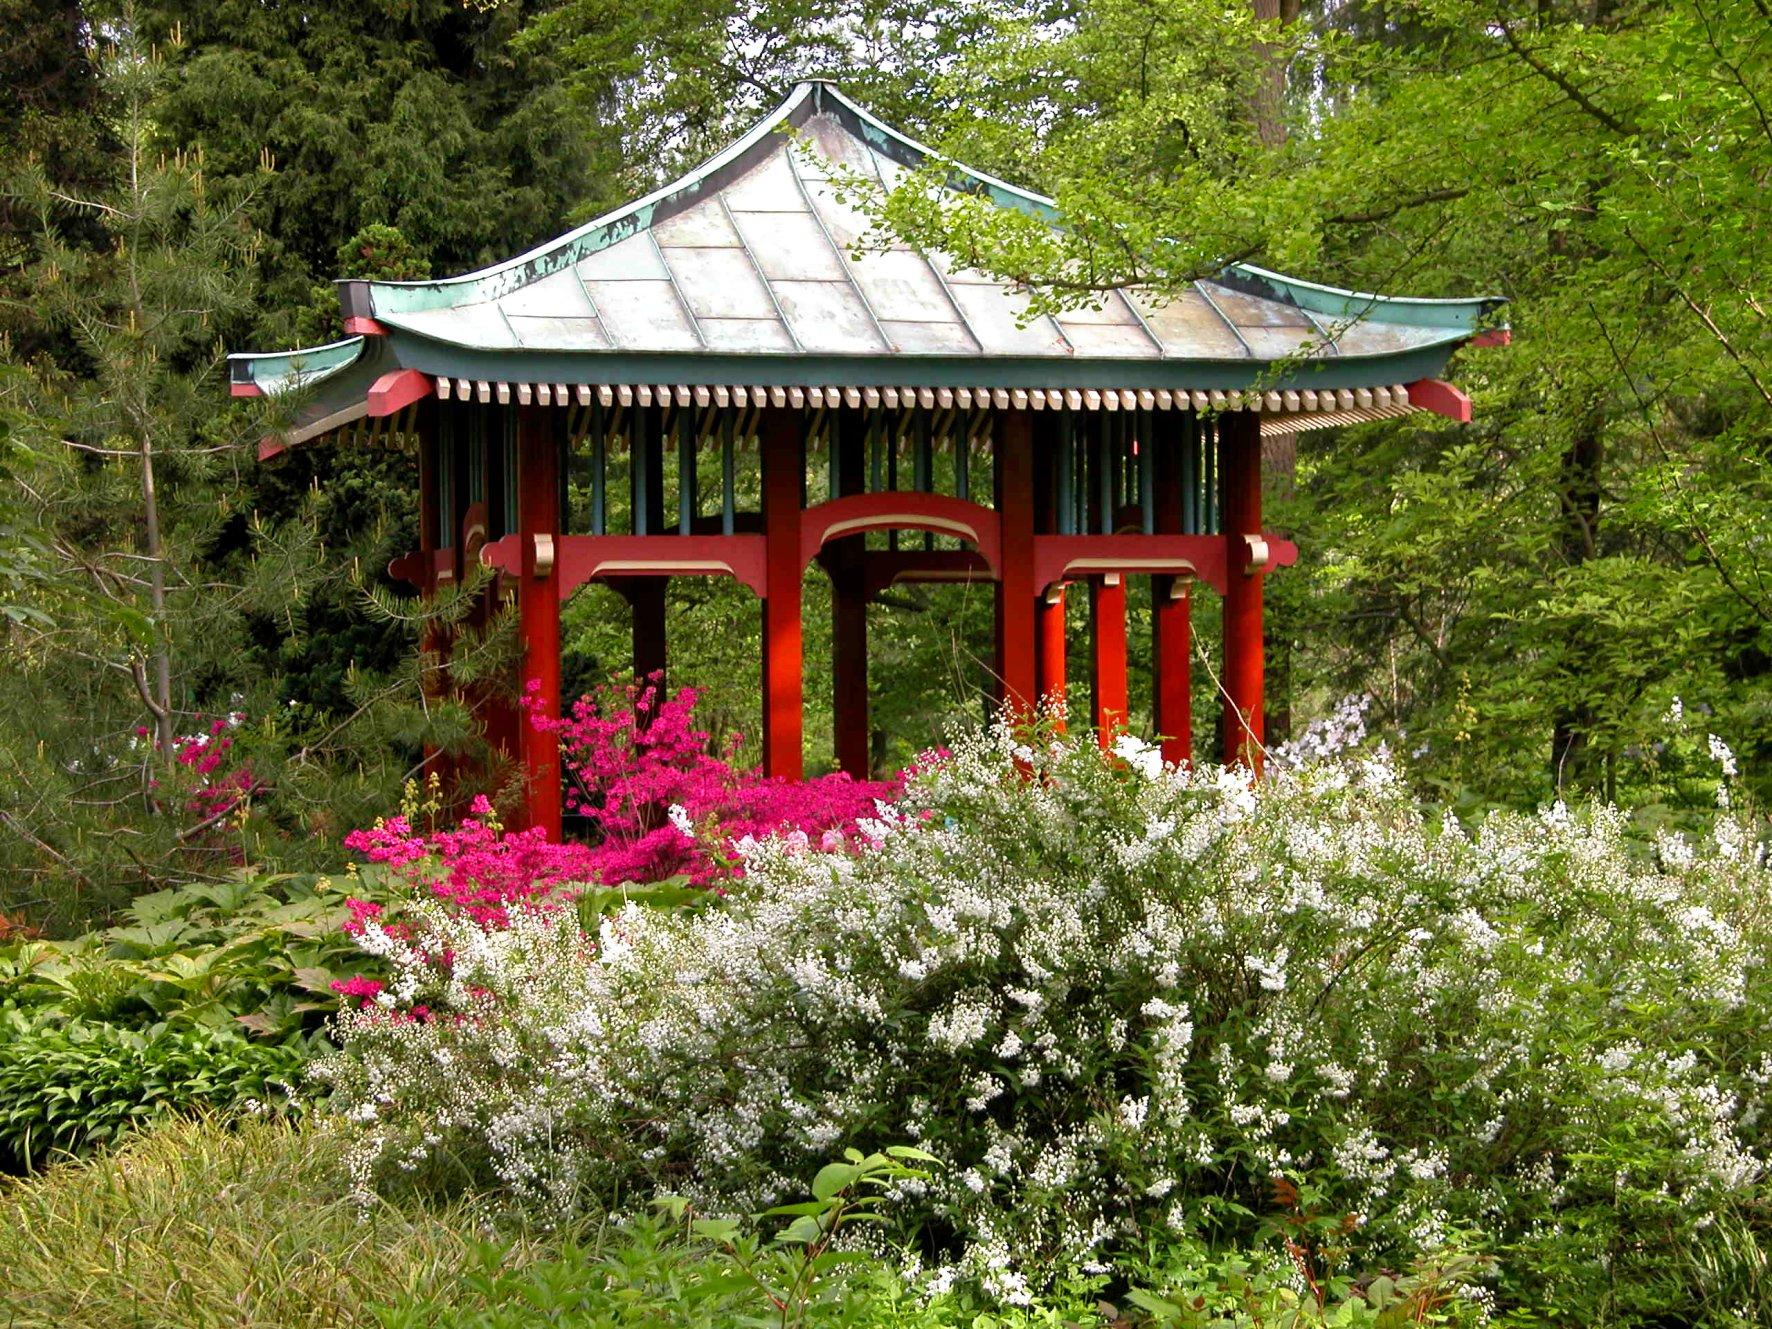 japan pavillon leere r ume und exotisches feeling all berall foto i haas botanischer. Black Bedroom Furniture Sets. Home Design Ideas